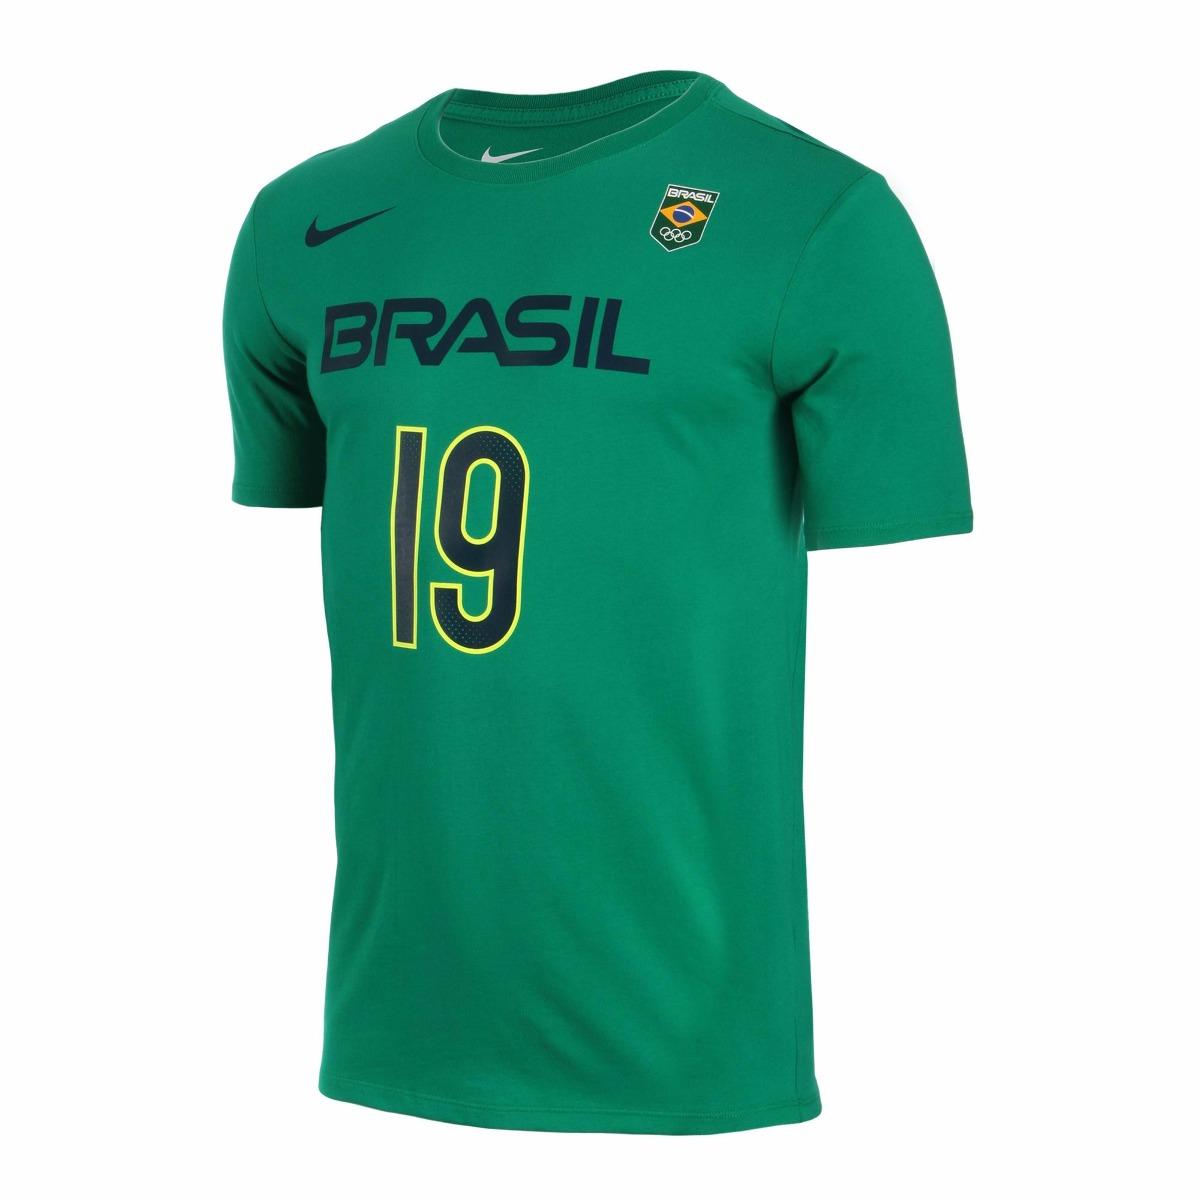 eba328021 camisa nike basquete brasil barbosa masculina. Carregando zoom.